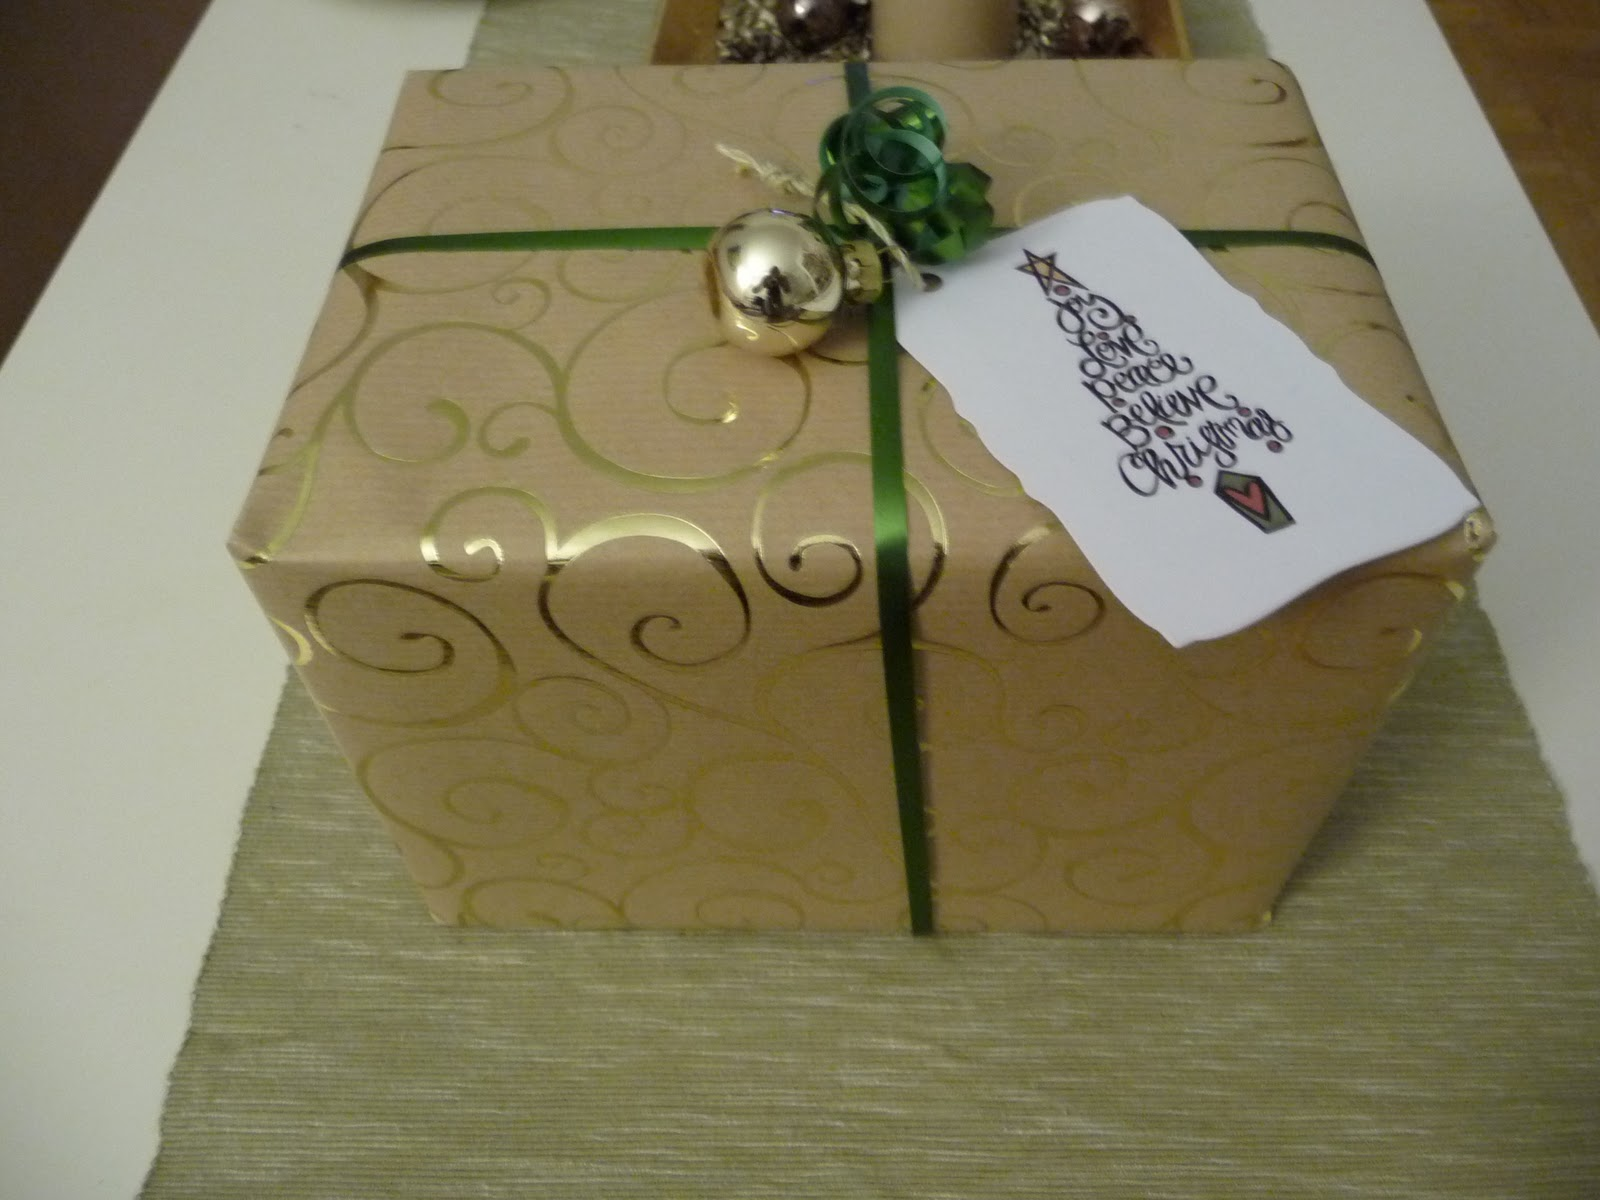 Geschenke einpacken juju creativ - Nanu nana weihnachten ...